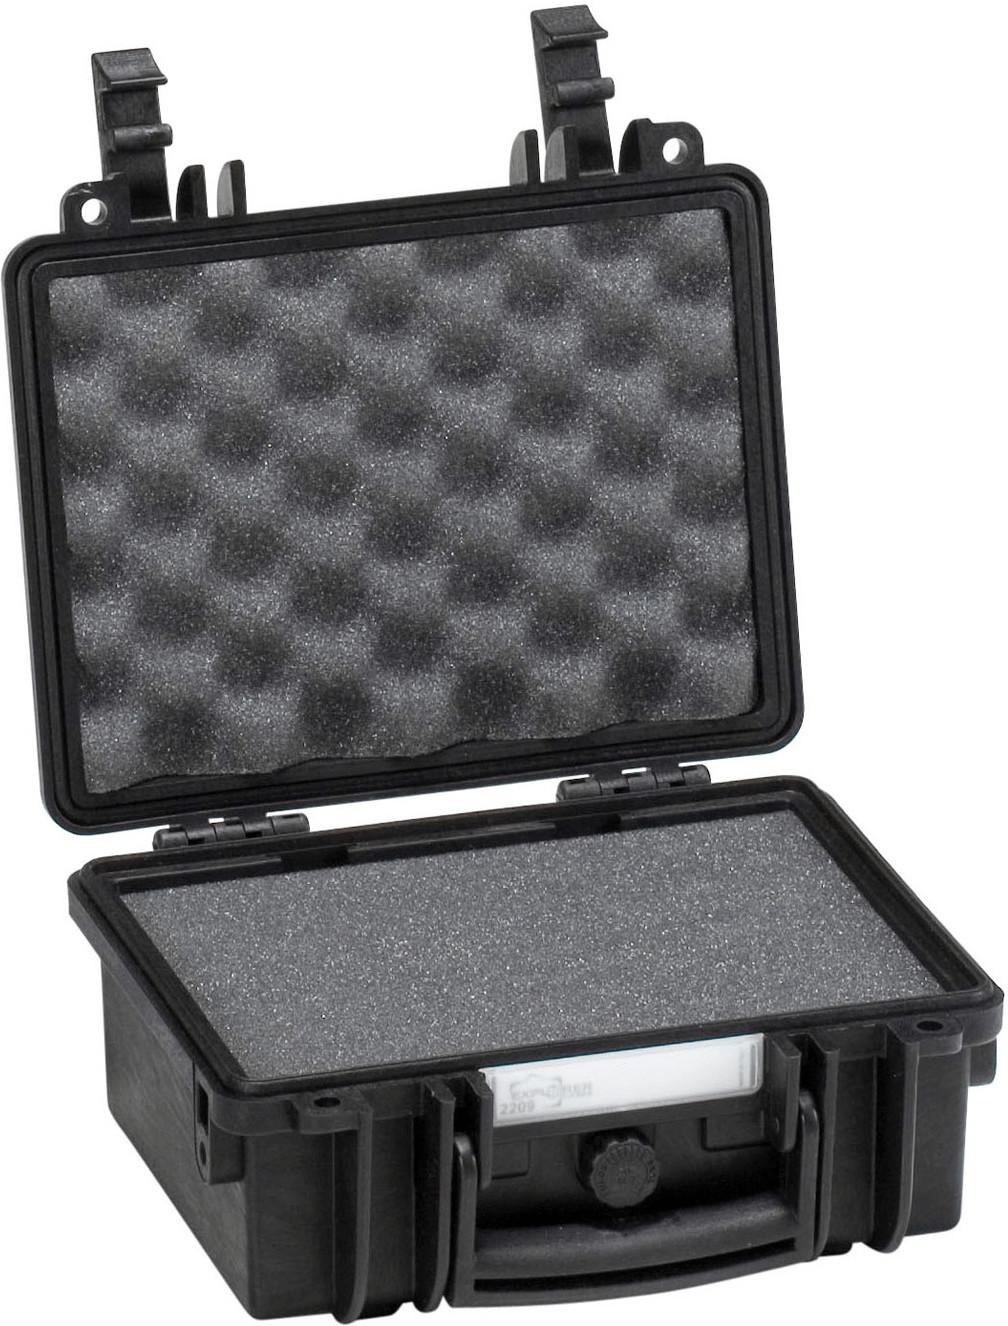 Image of Explorer Cases 2209 B